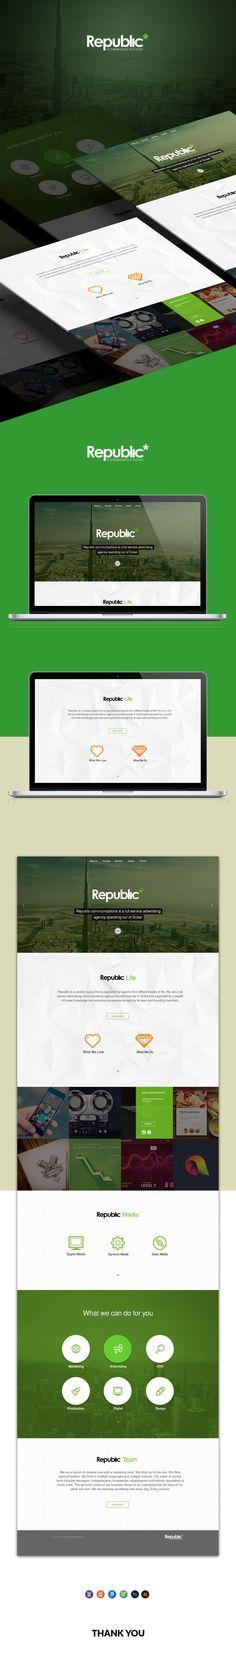 Republic on Behance